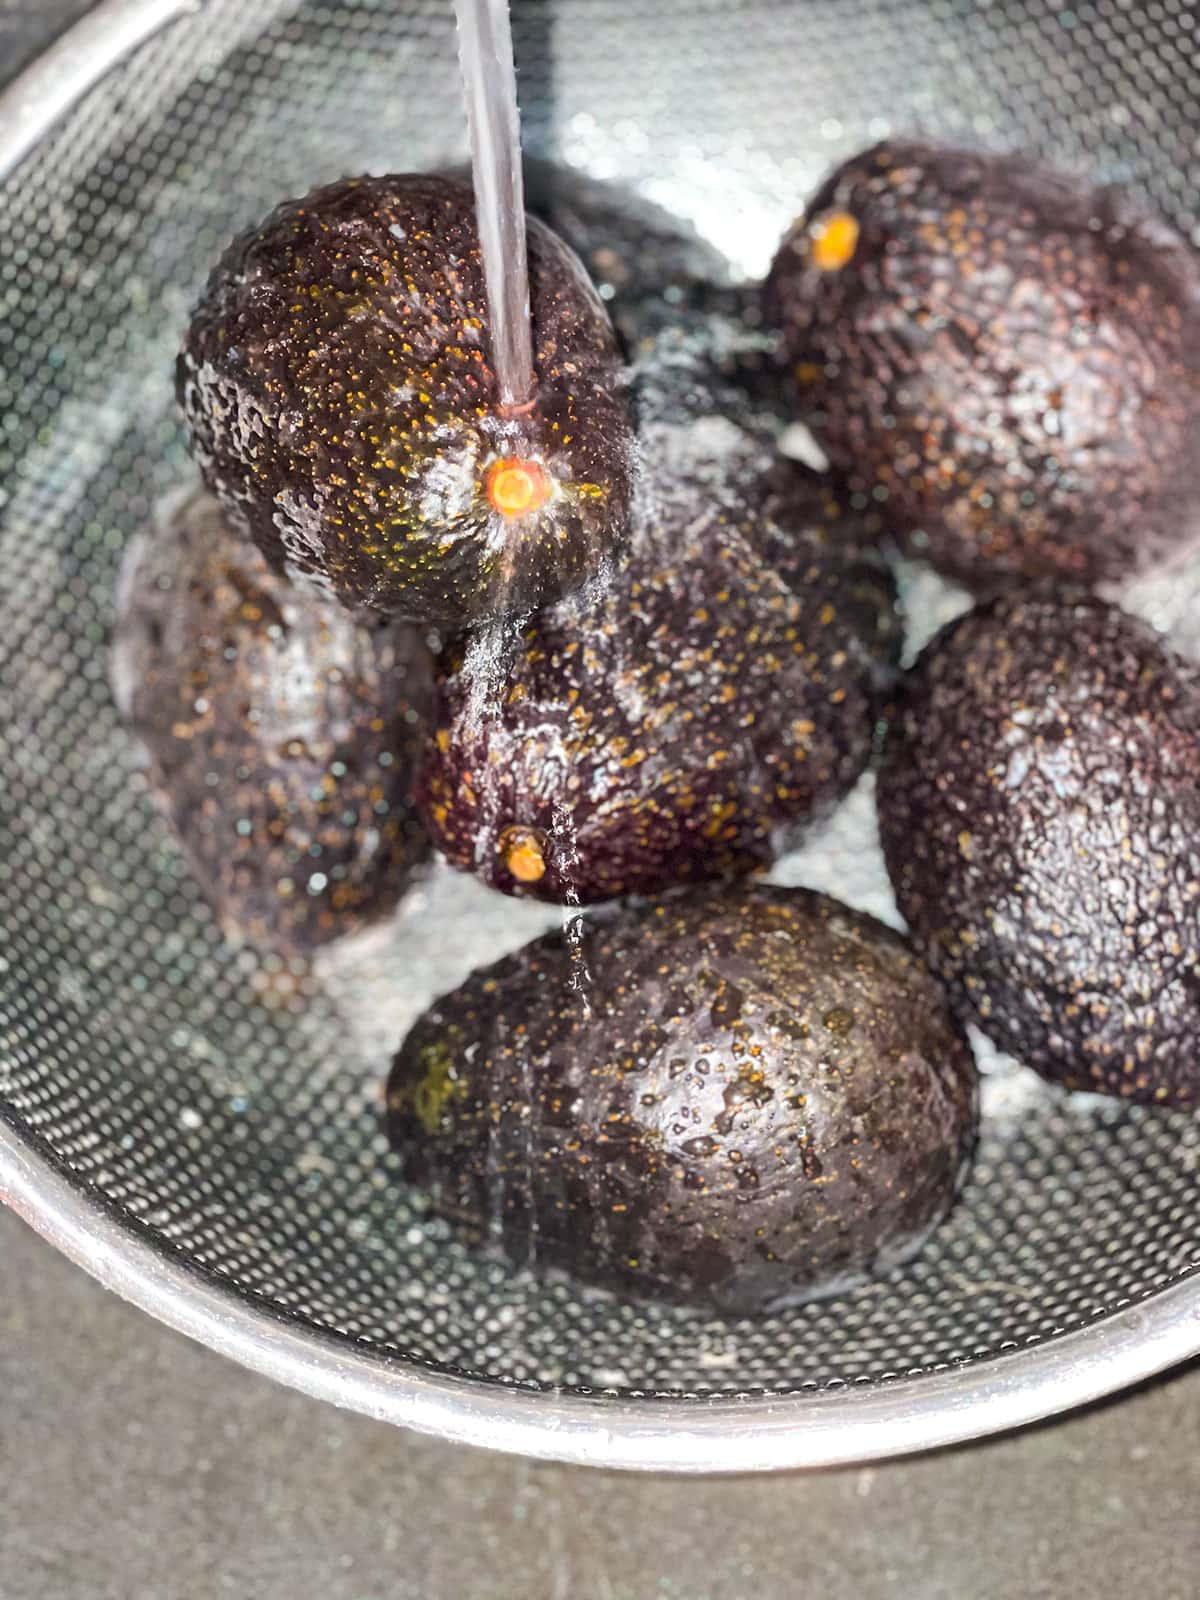 Washing avocado fruits